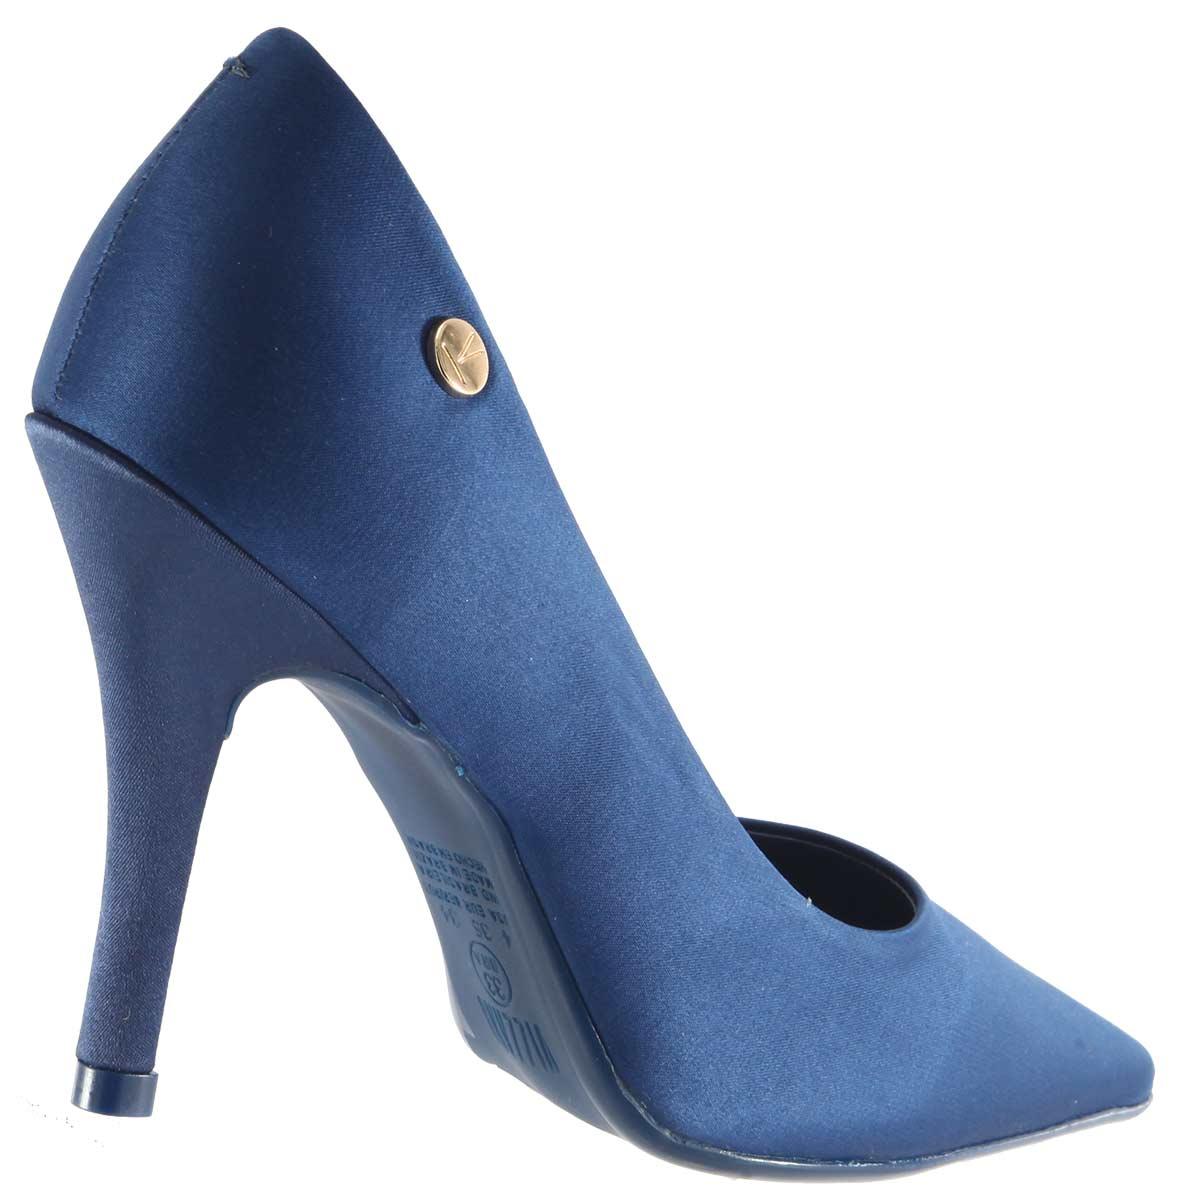 Sapato Vizzano Scarpin Feminino Cetim Glamour 1184301  - Ian Calçados